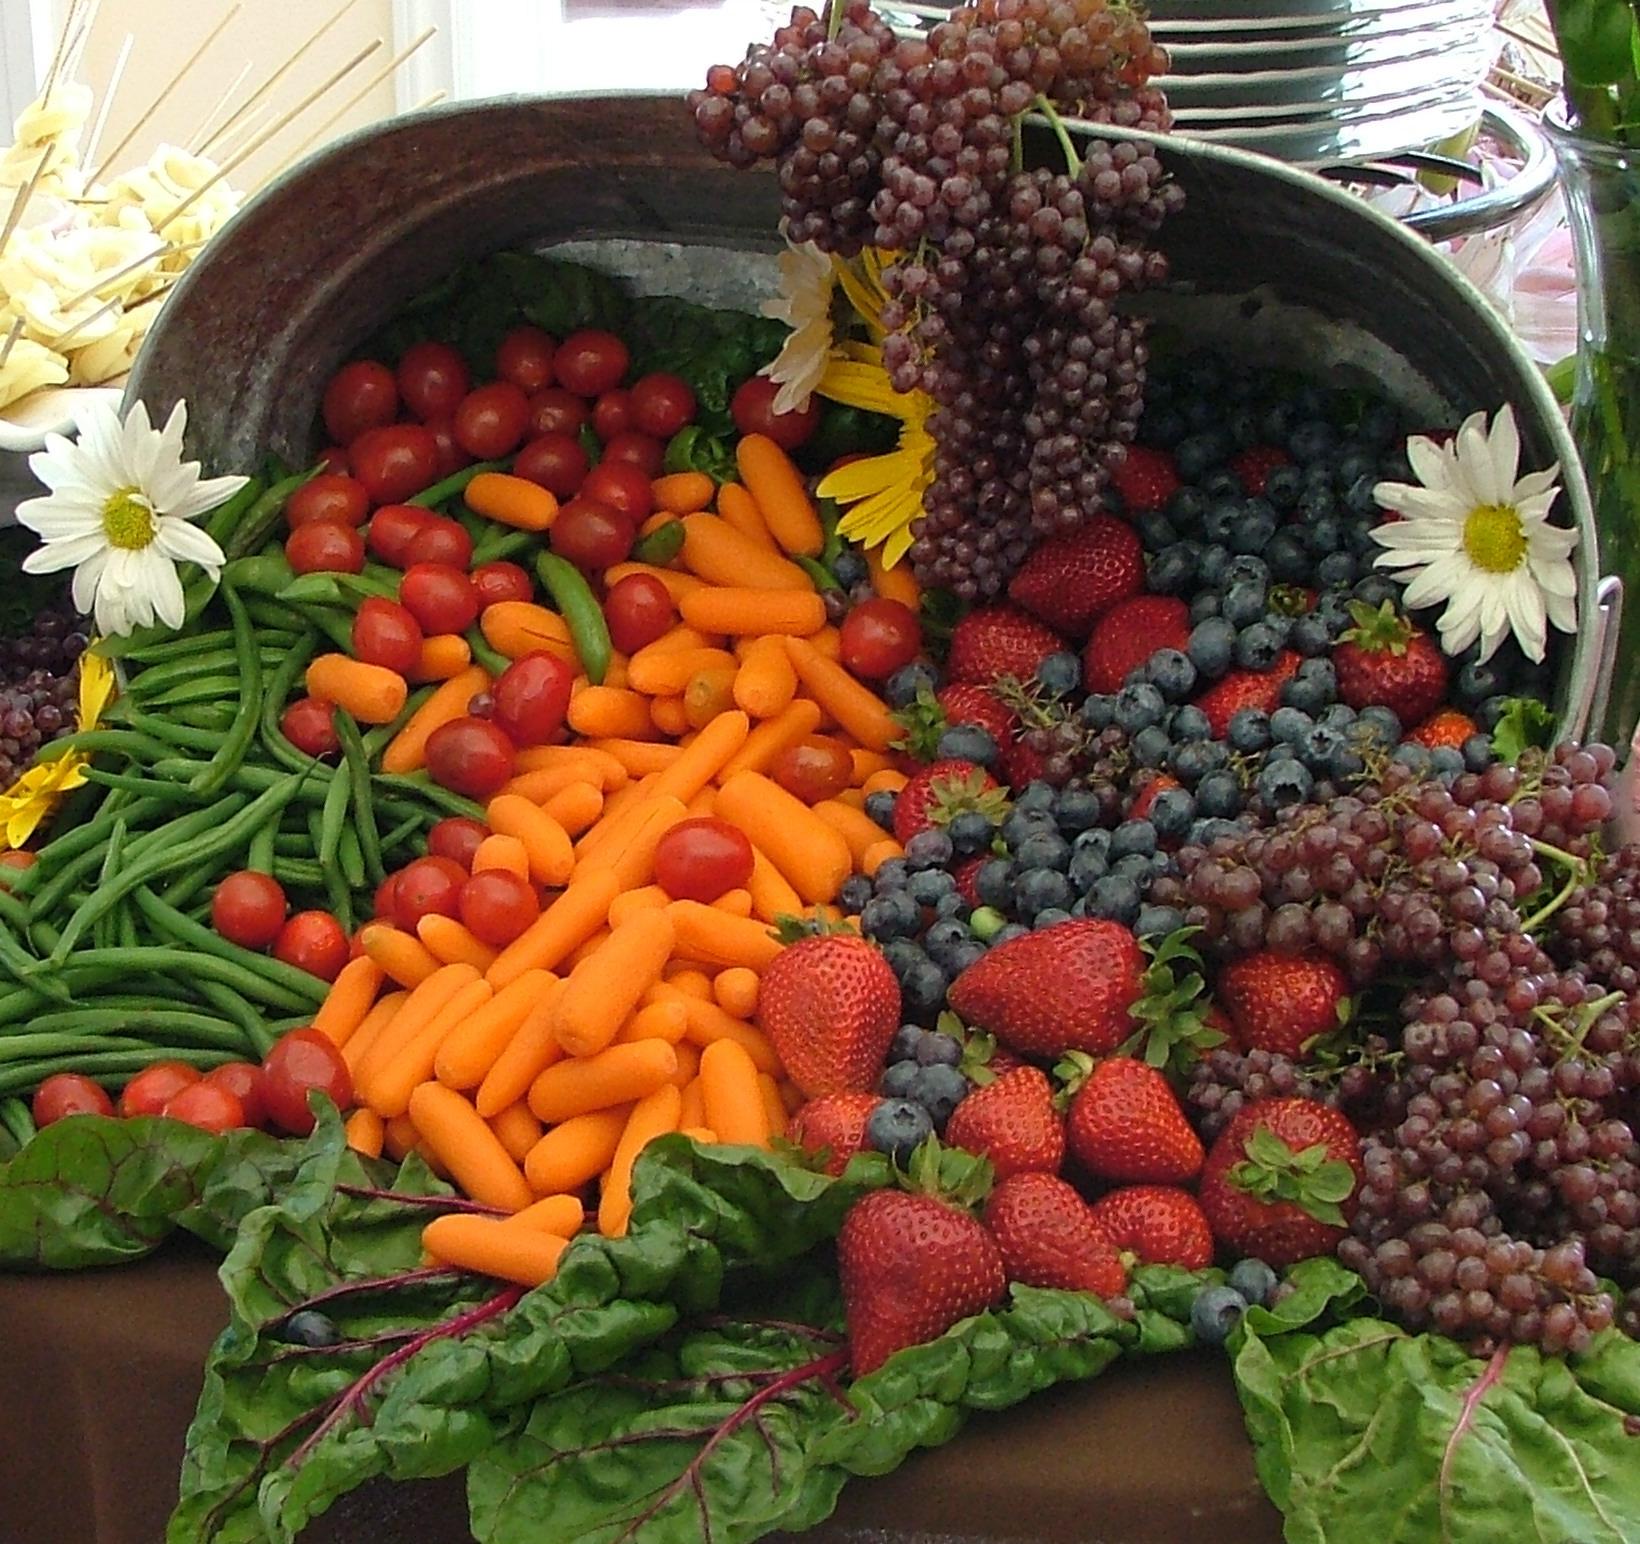 filecornucopia of fruit and vegetables wedding banquet